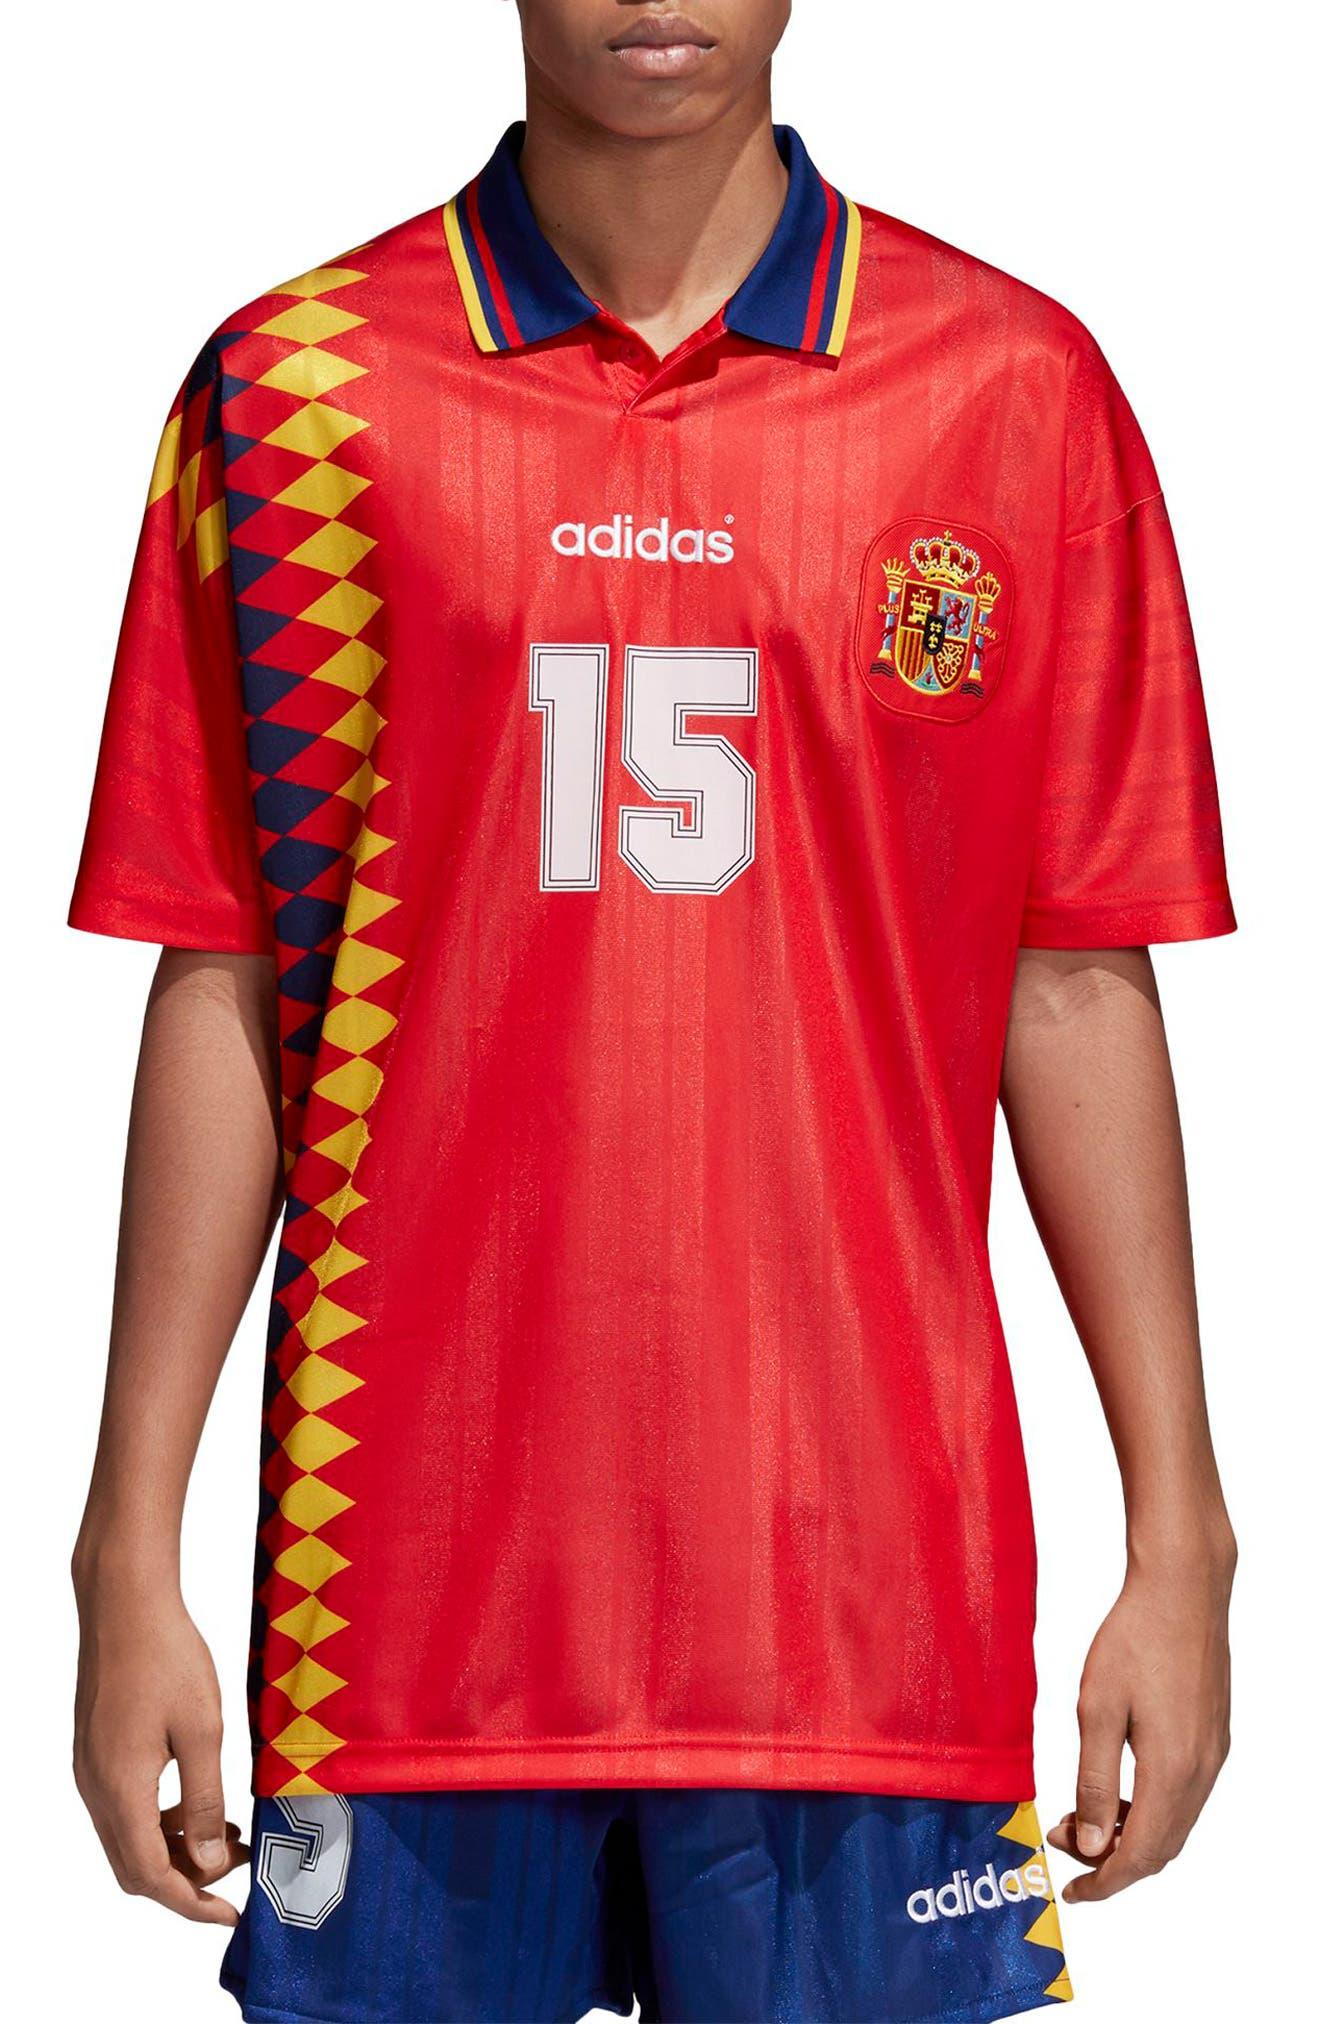 adidas Original Spain 1994 Soccer Jersey,                             Main thumbnail 1, color,                             625